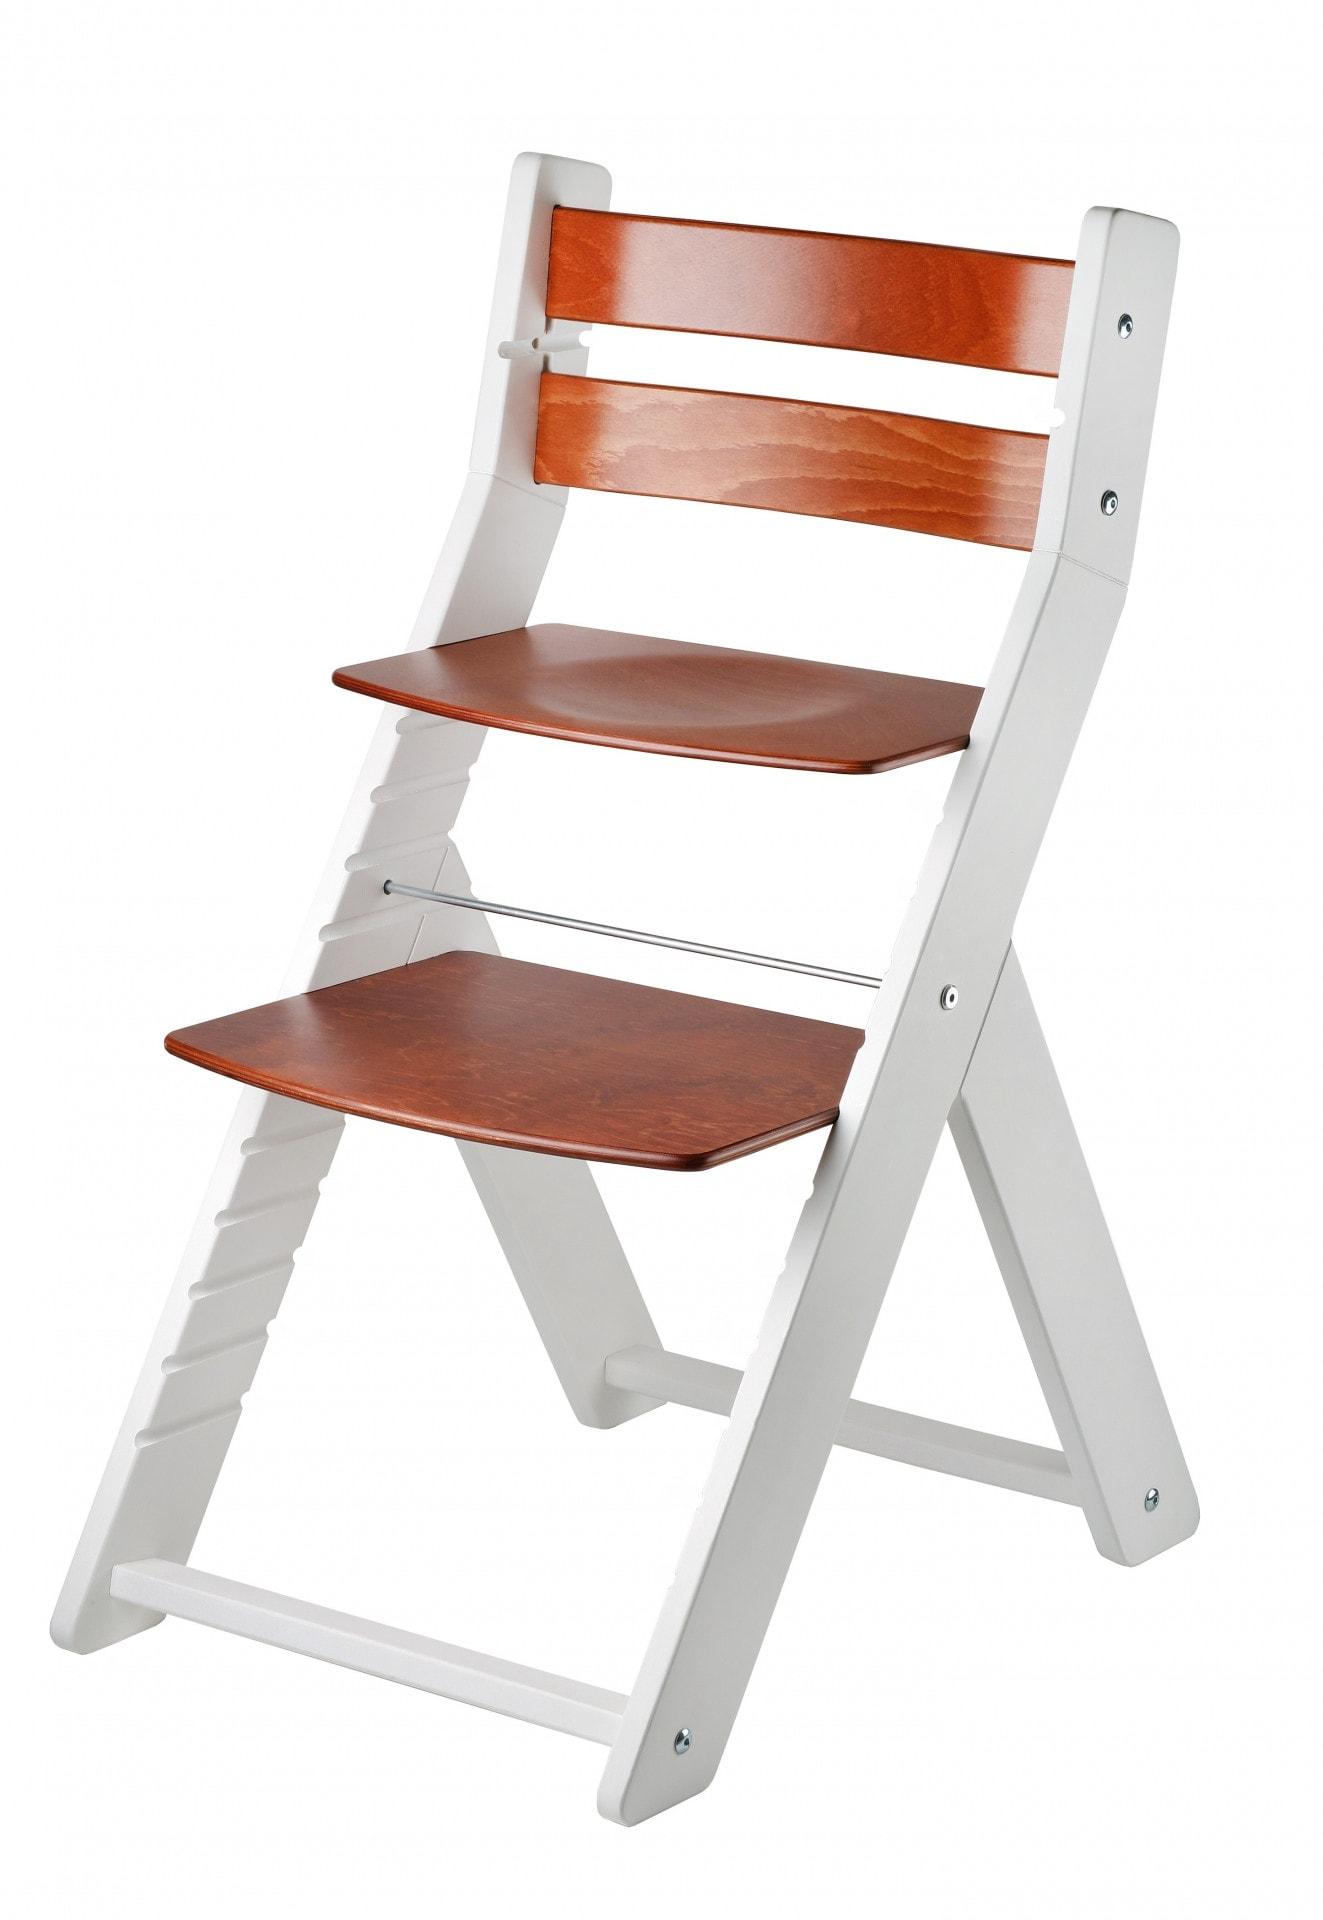 Wood Partner Rostoucí židle Sandy - bílá / mahagon